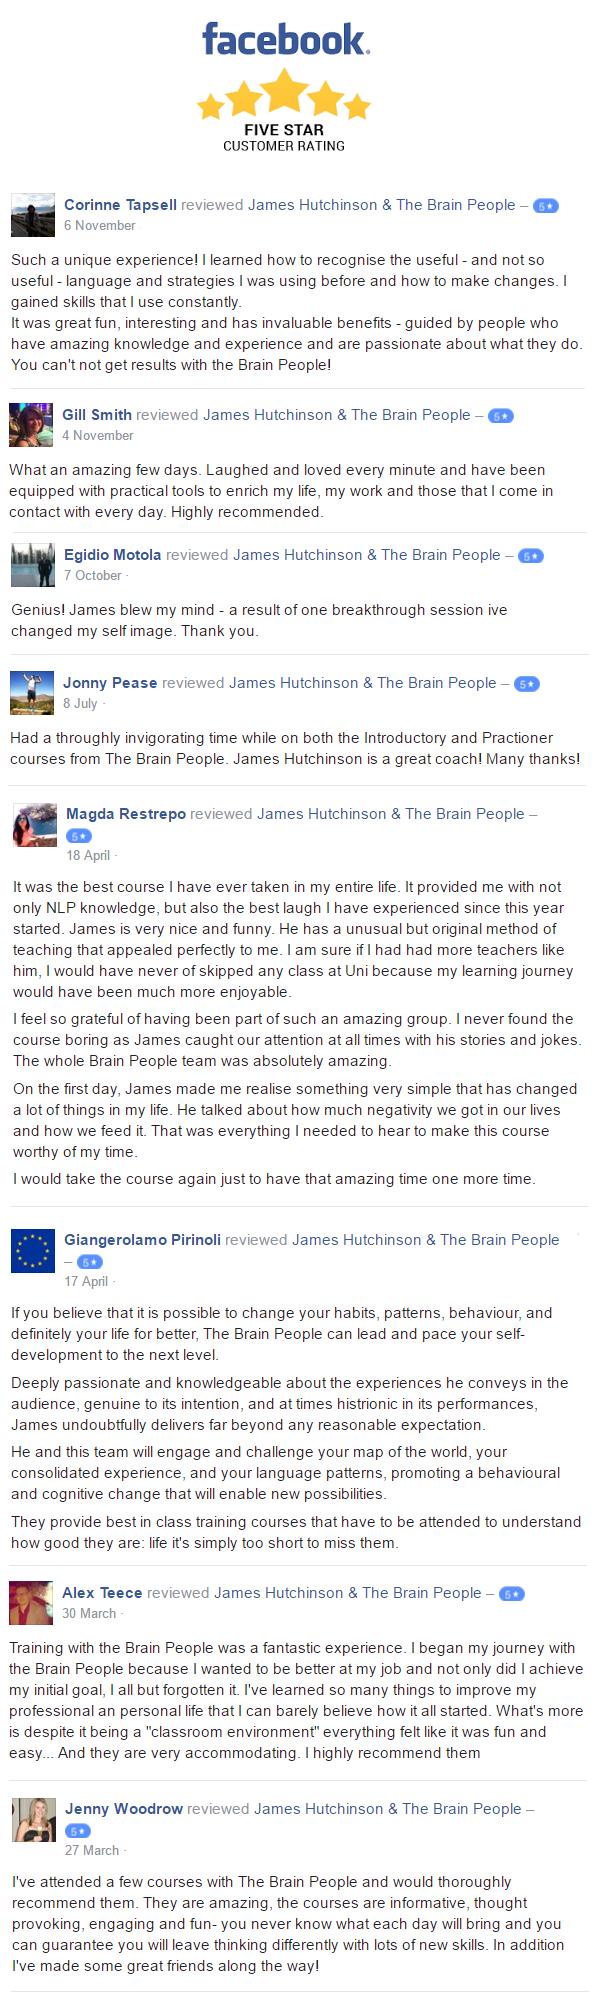 Some Recent Facebook Reviews